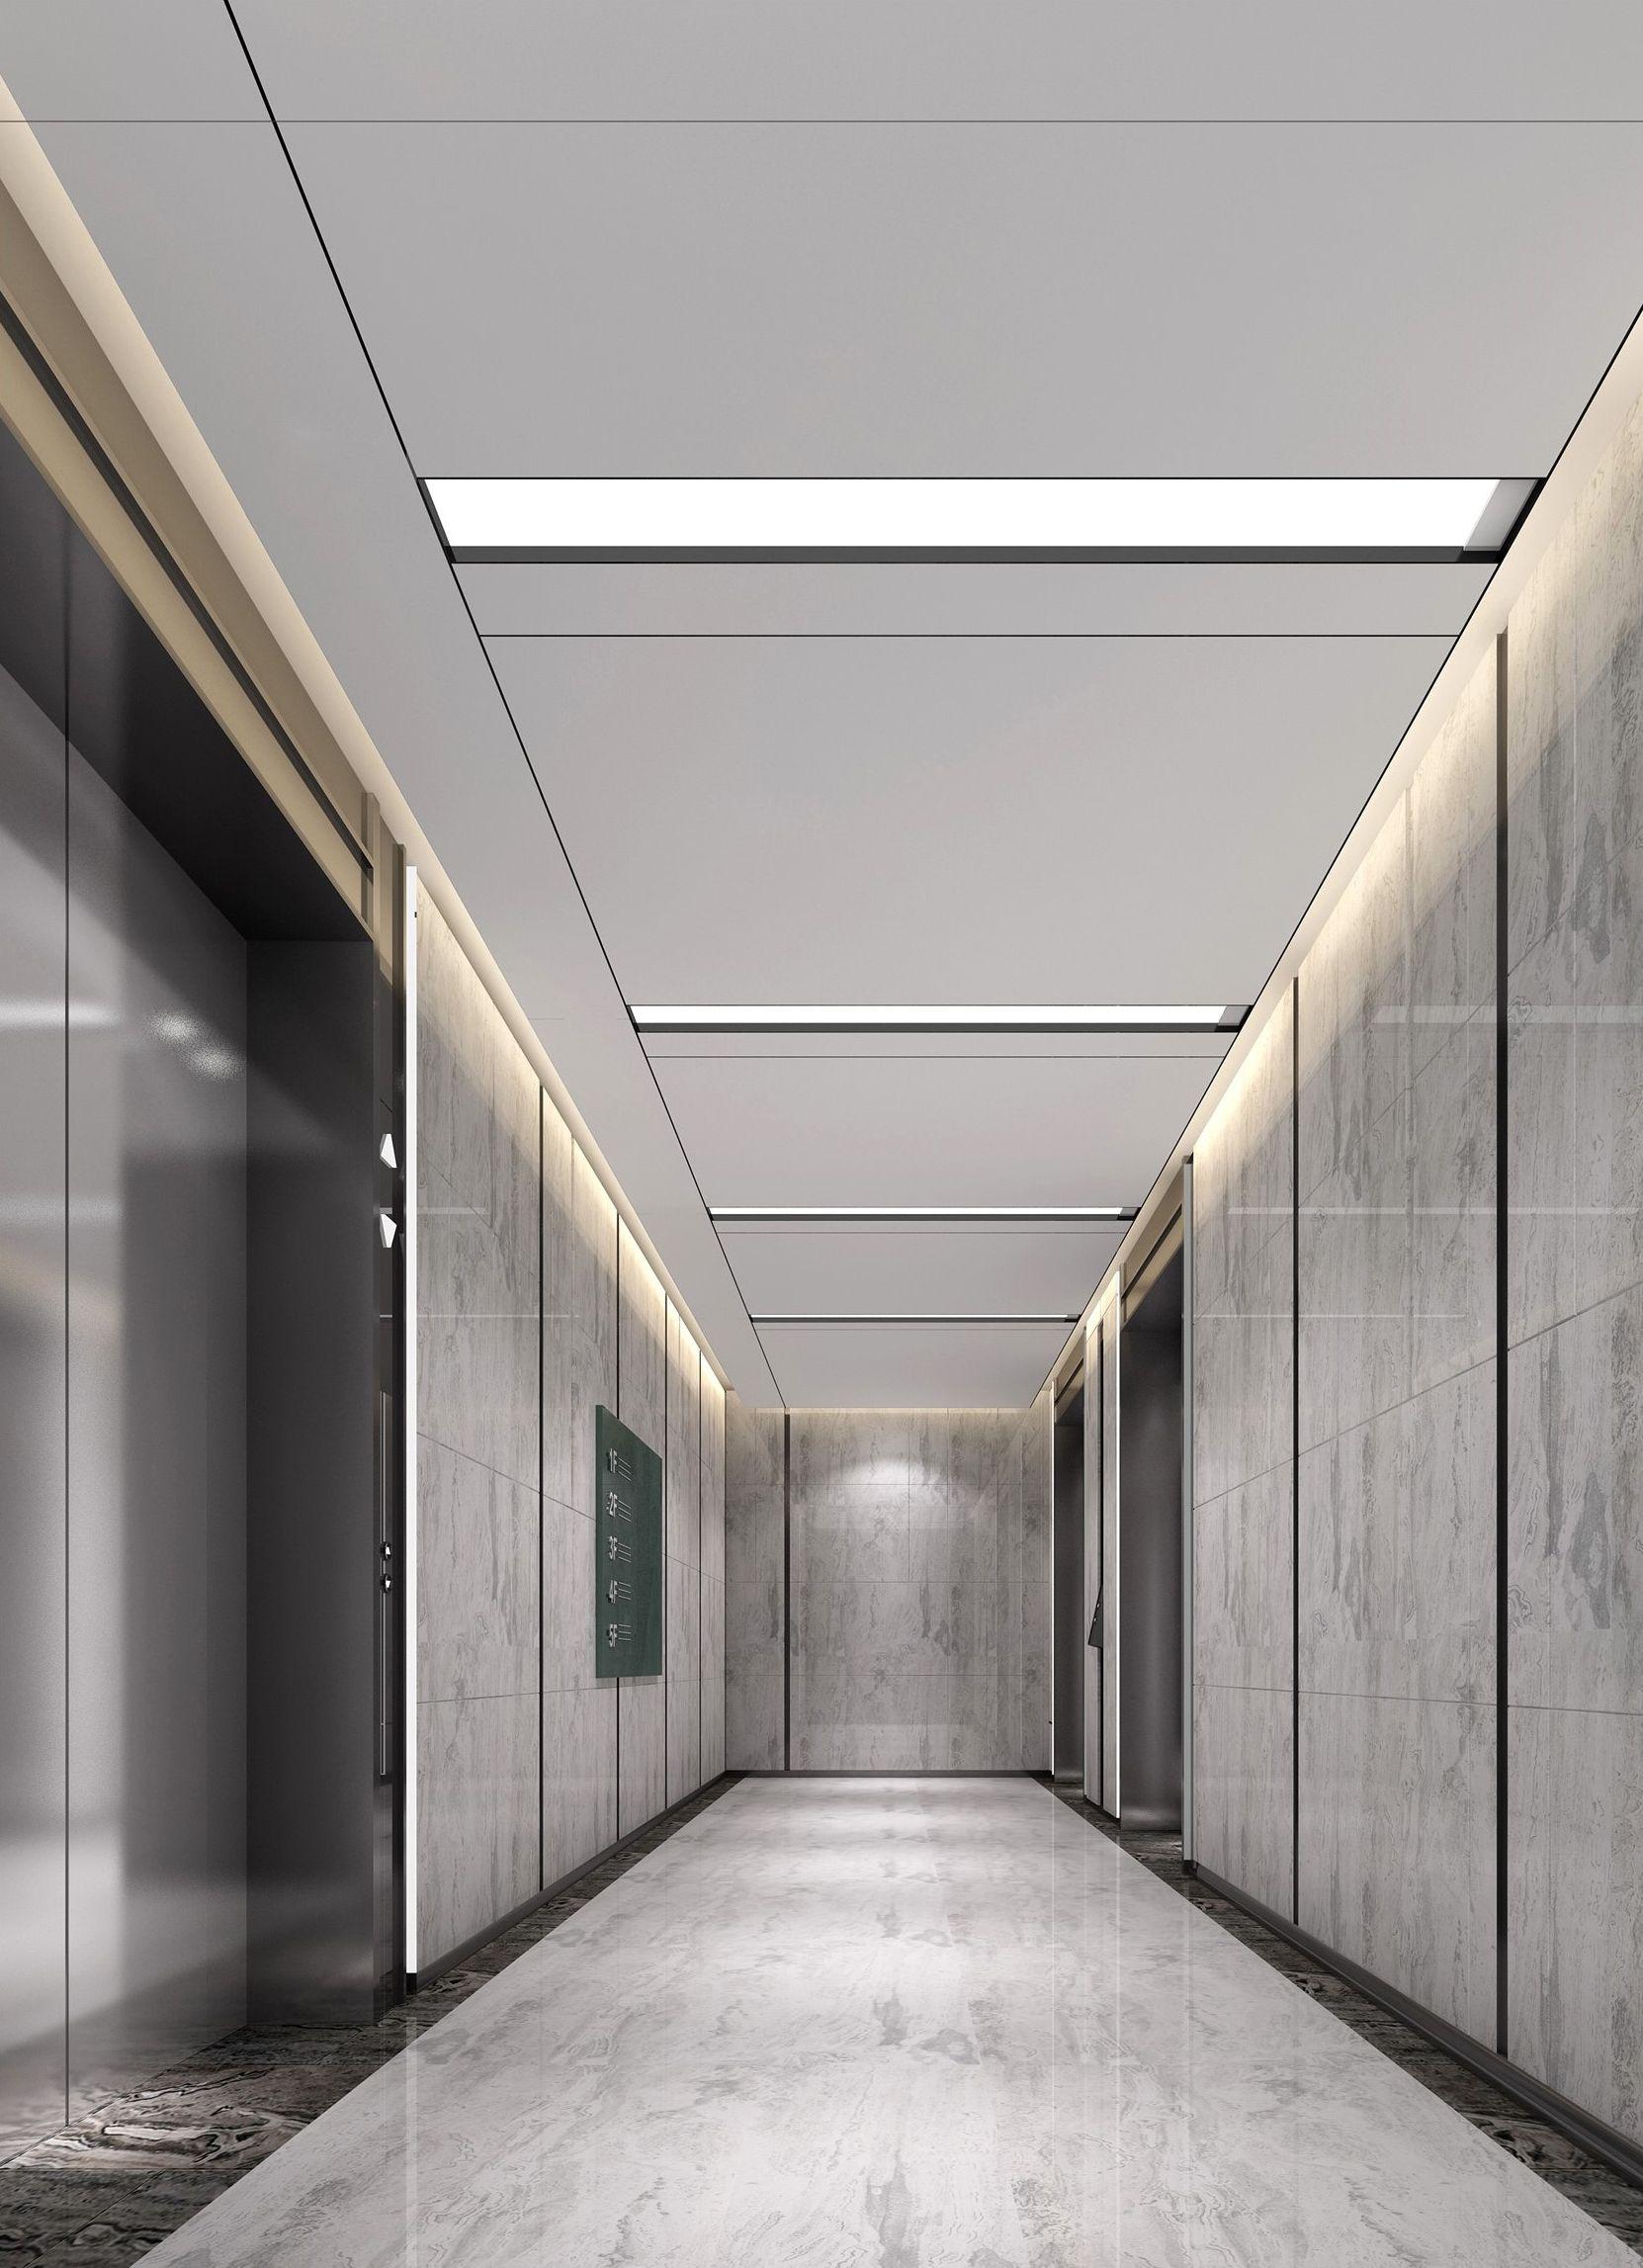 Gt lift shaft01 hallway pinterest lobbies corridor for Office hallway design